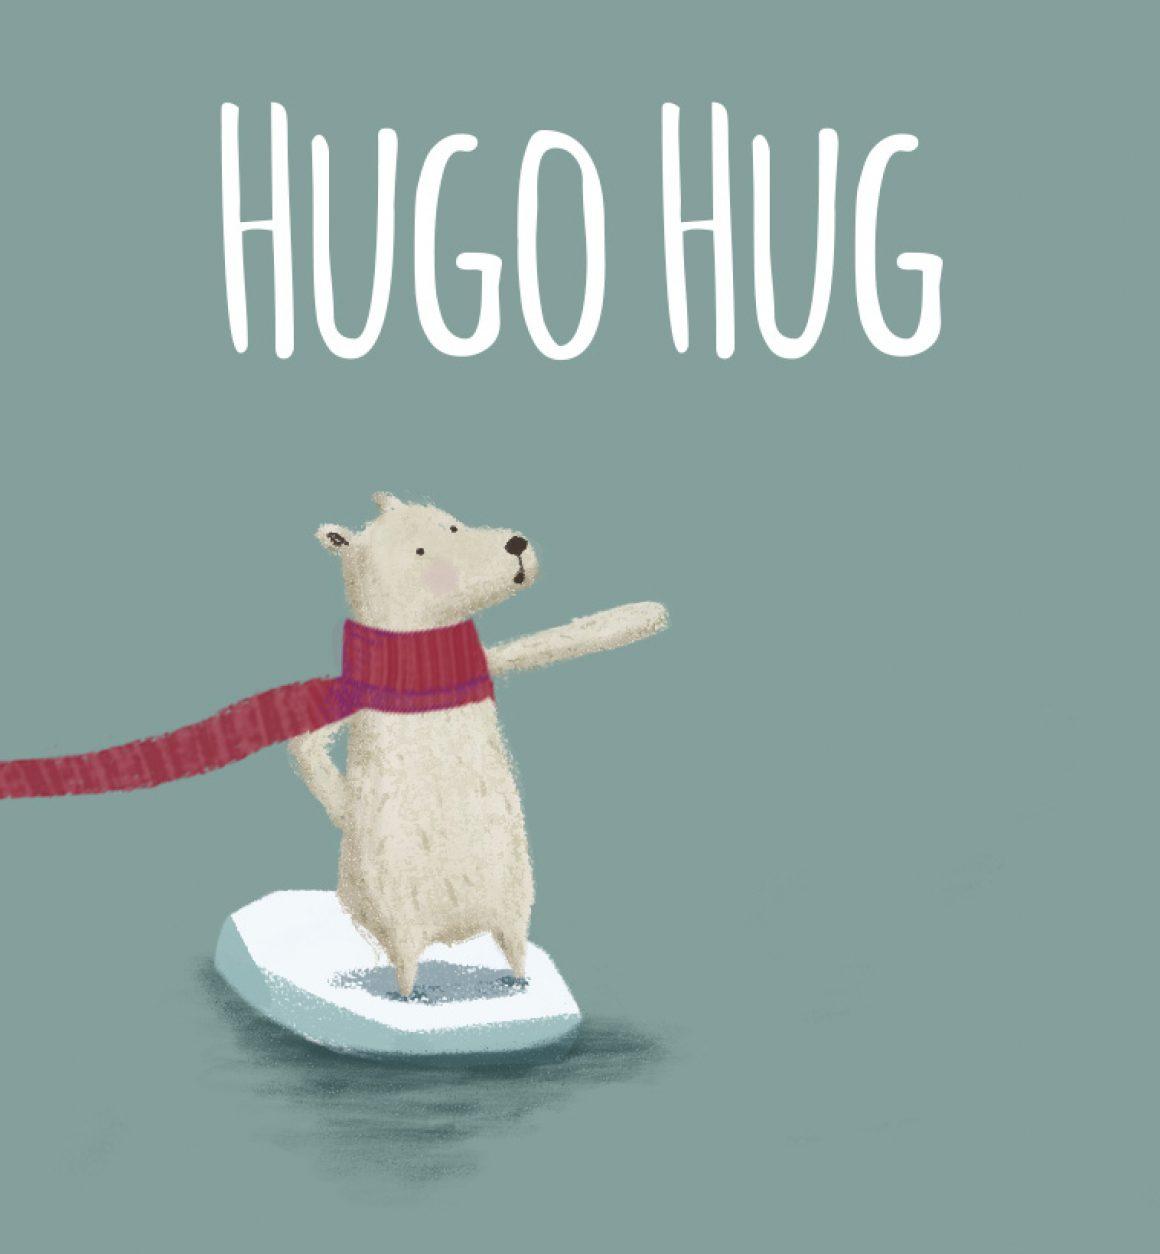 Hugo Hug